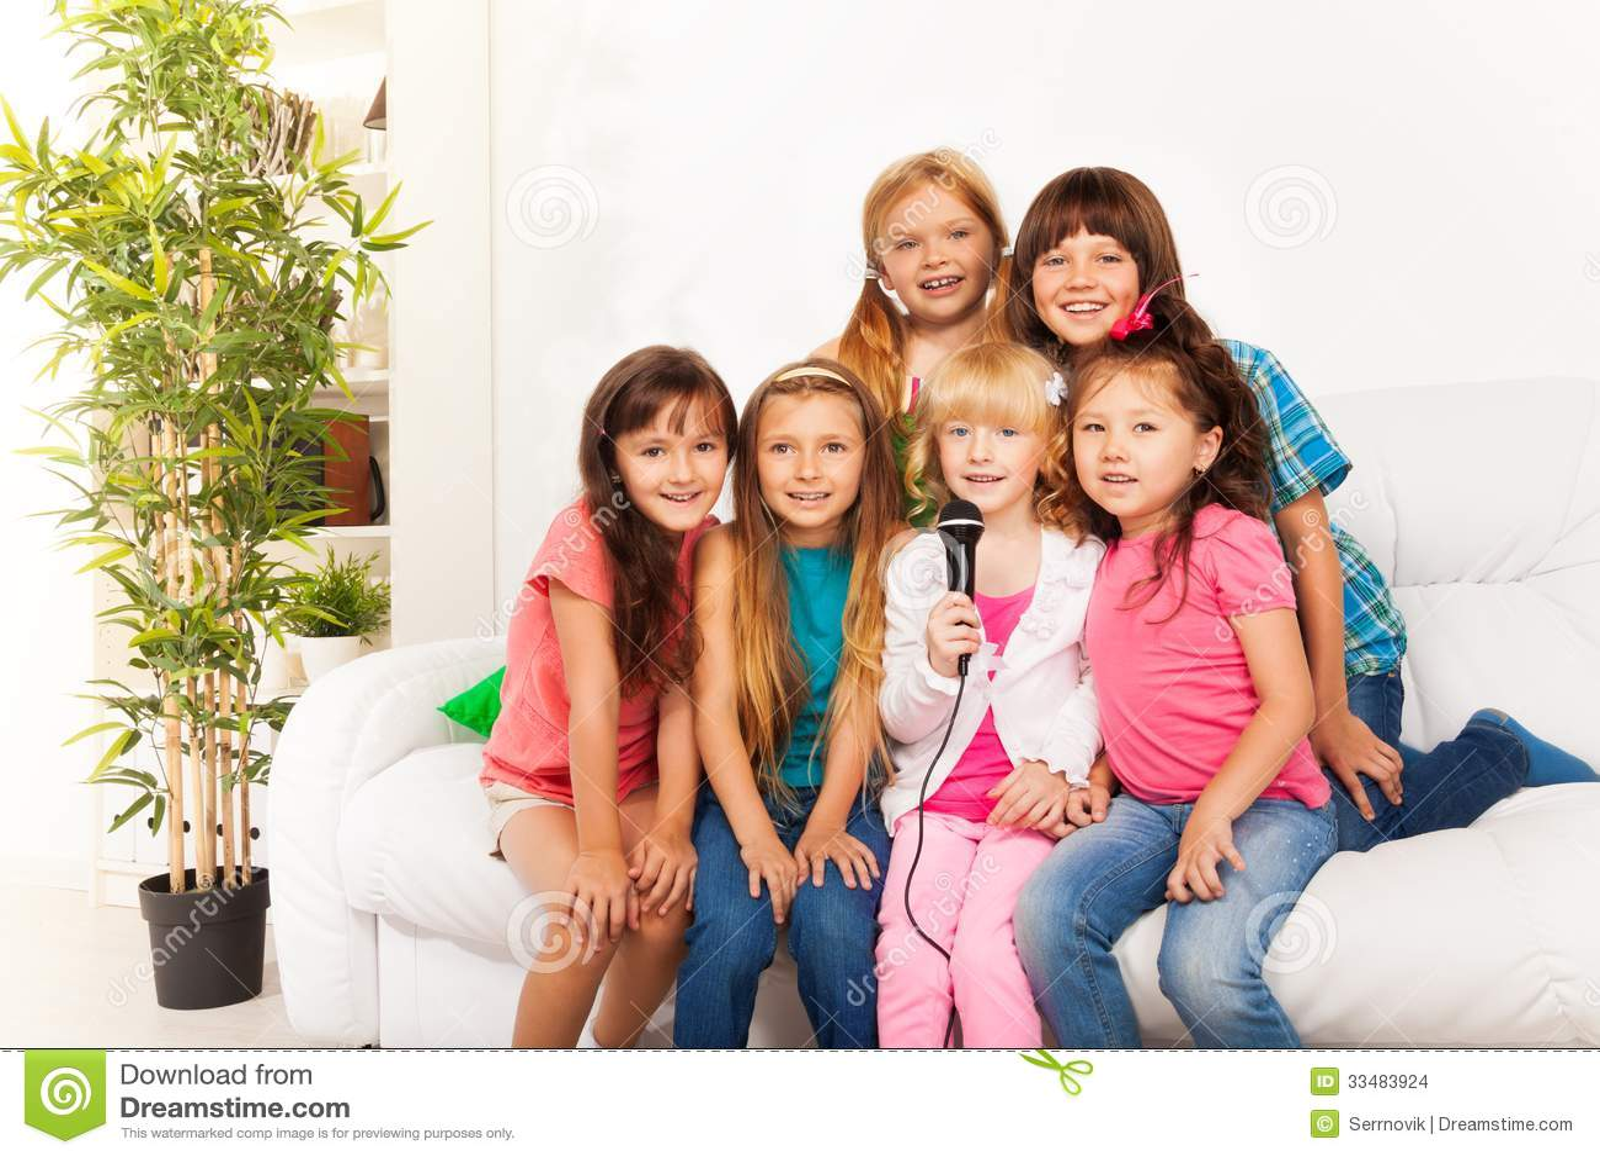 Много девушек вместе фото, ирина голая на улице